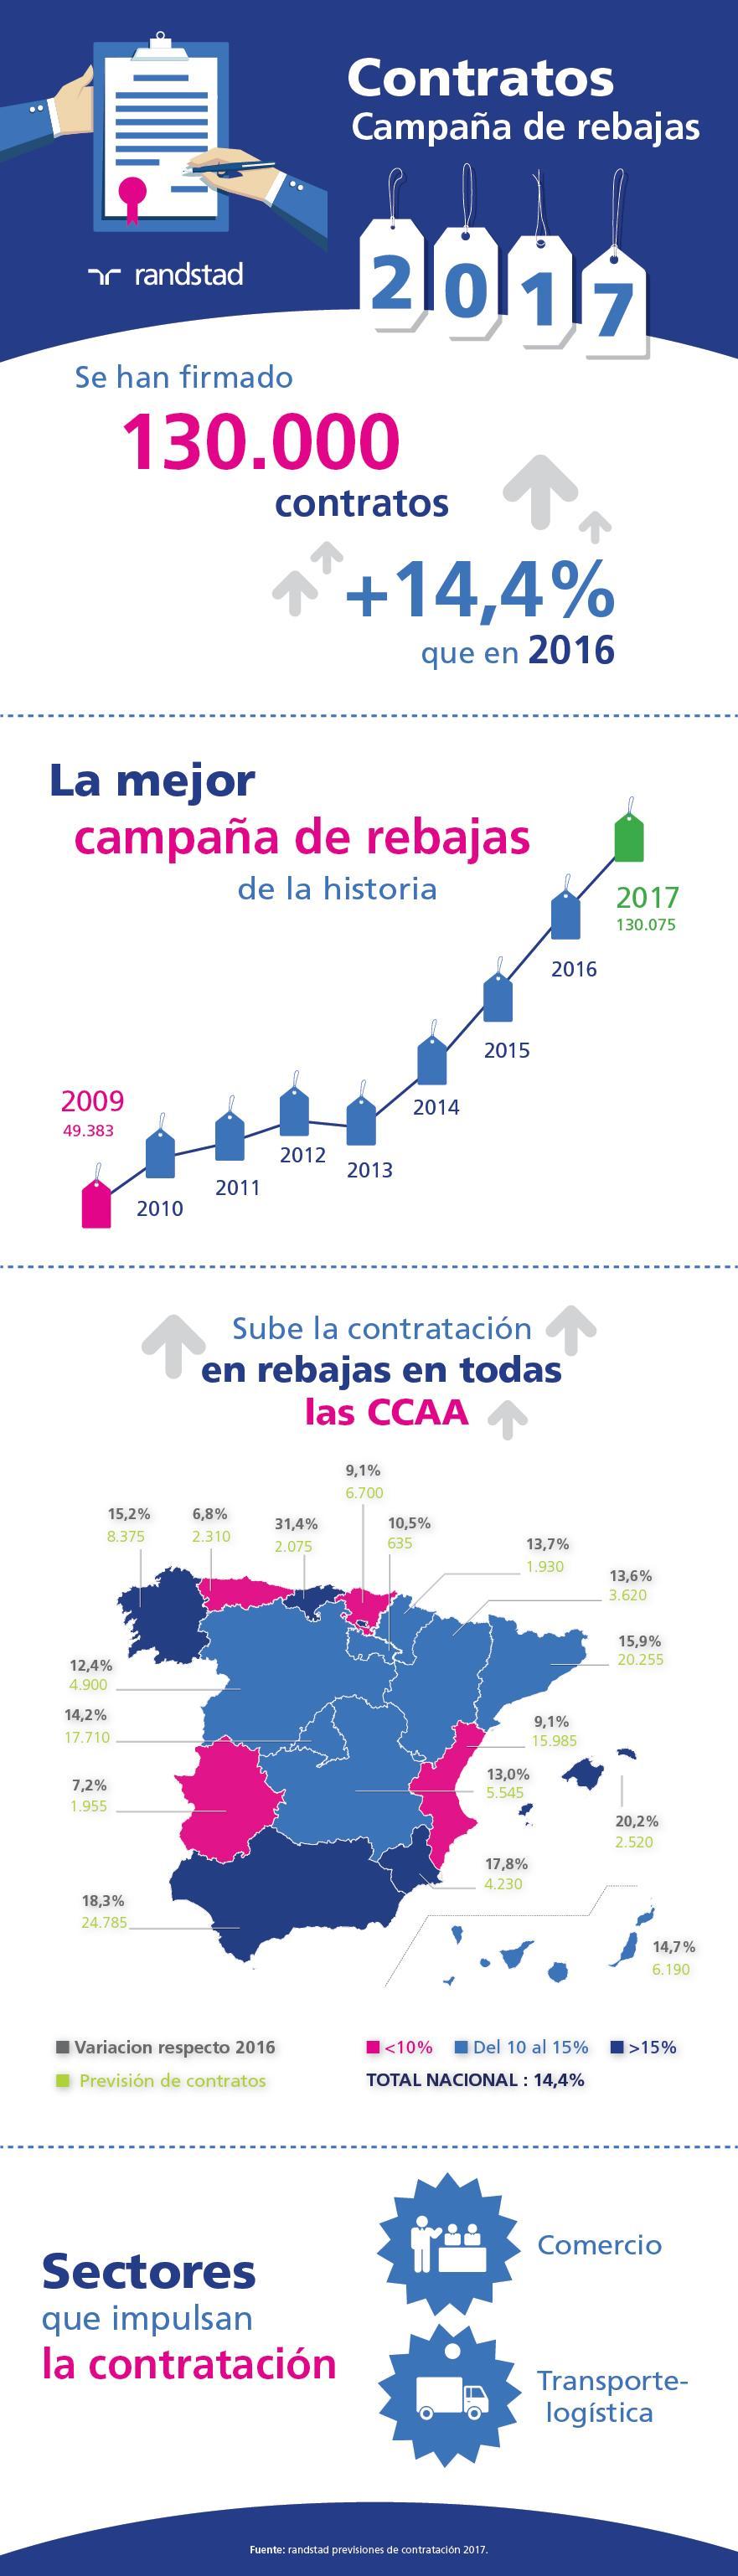 infografía previsión de contratación campaña rebajas 2017